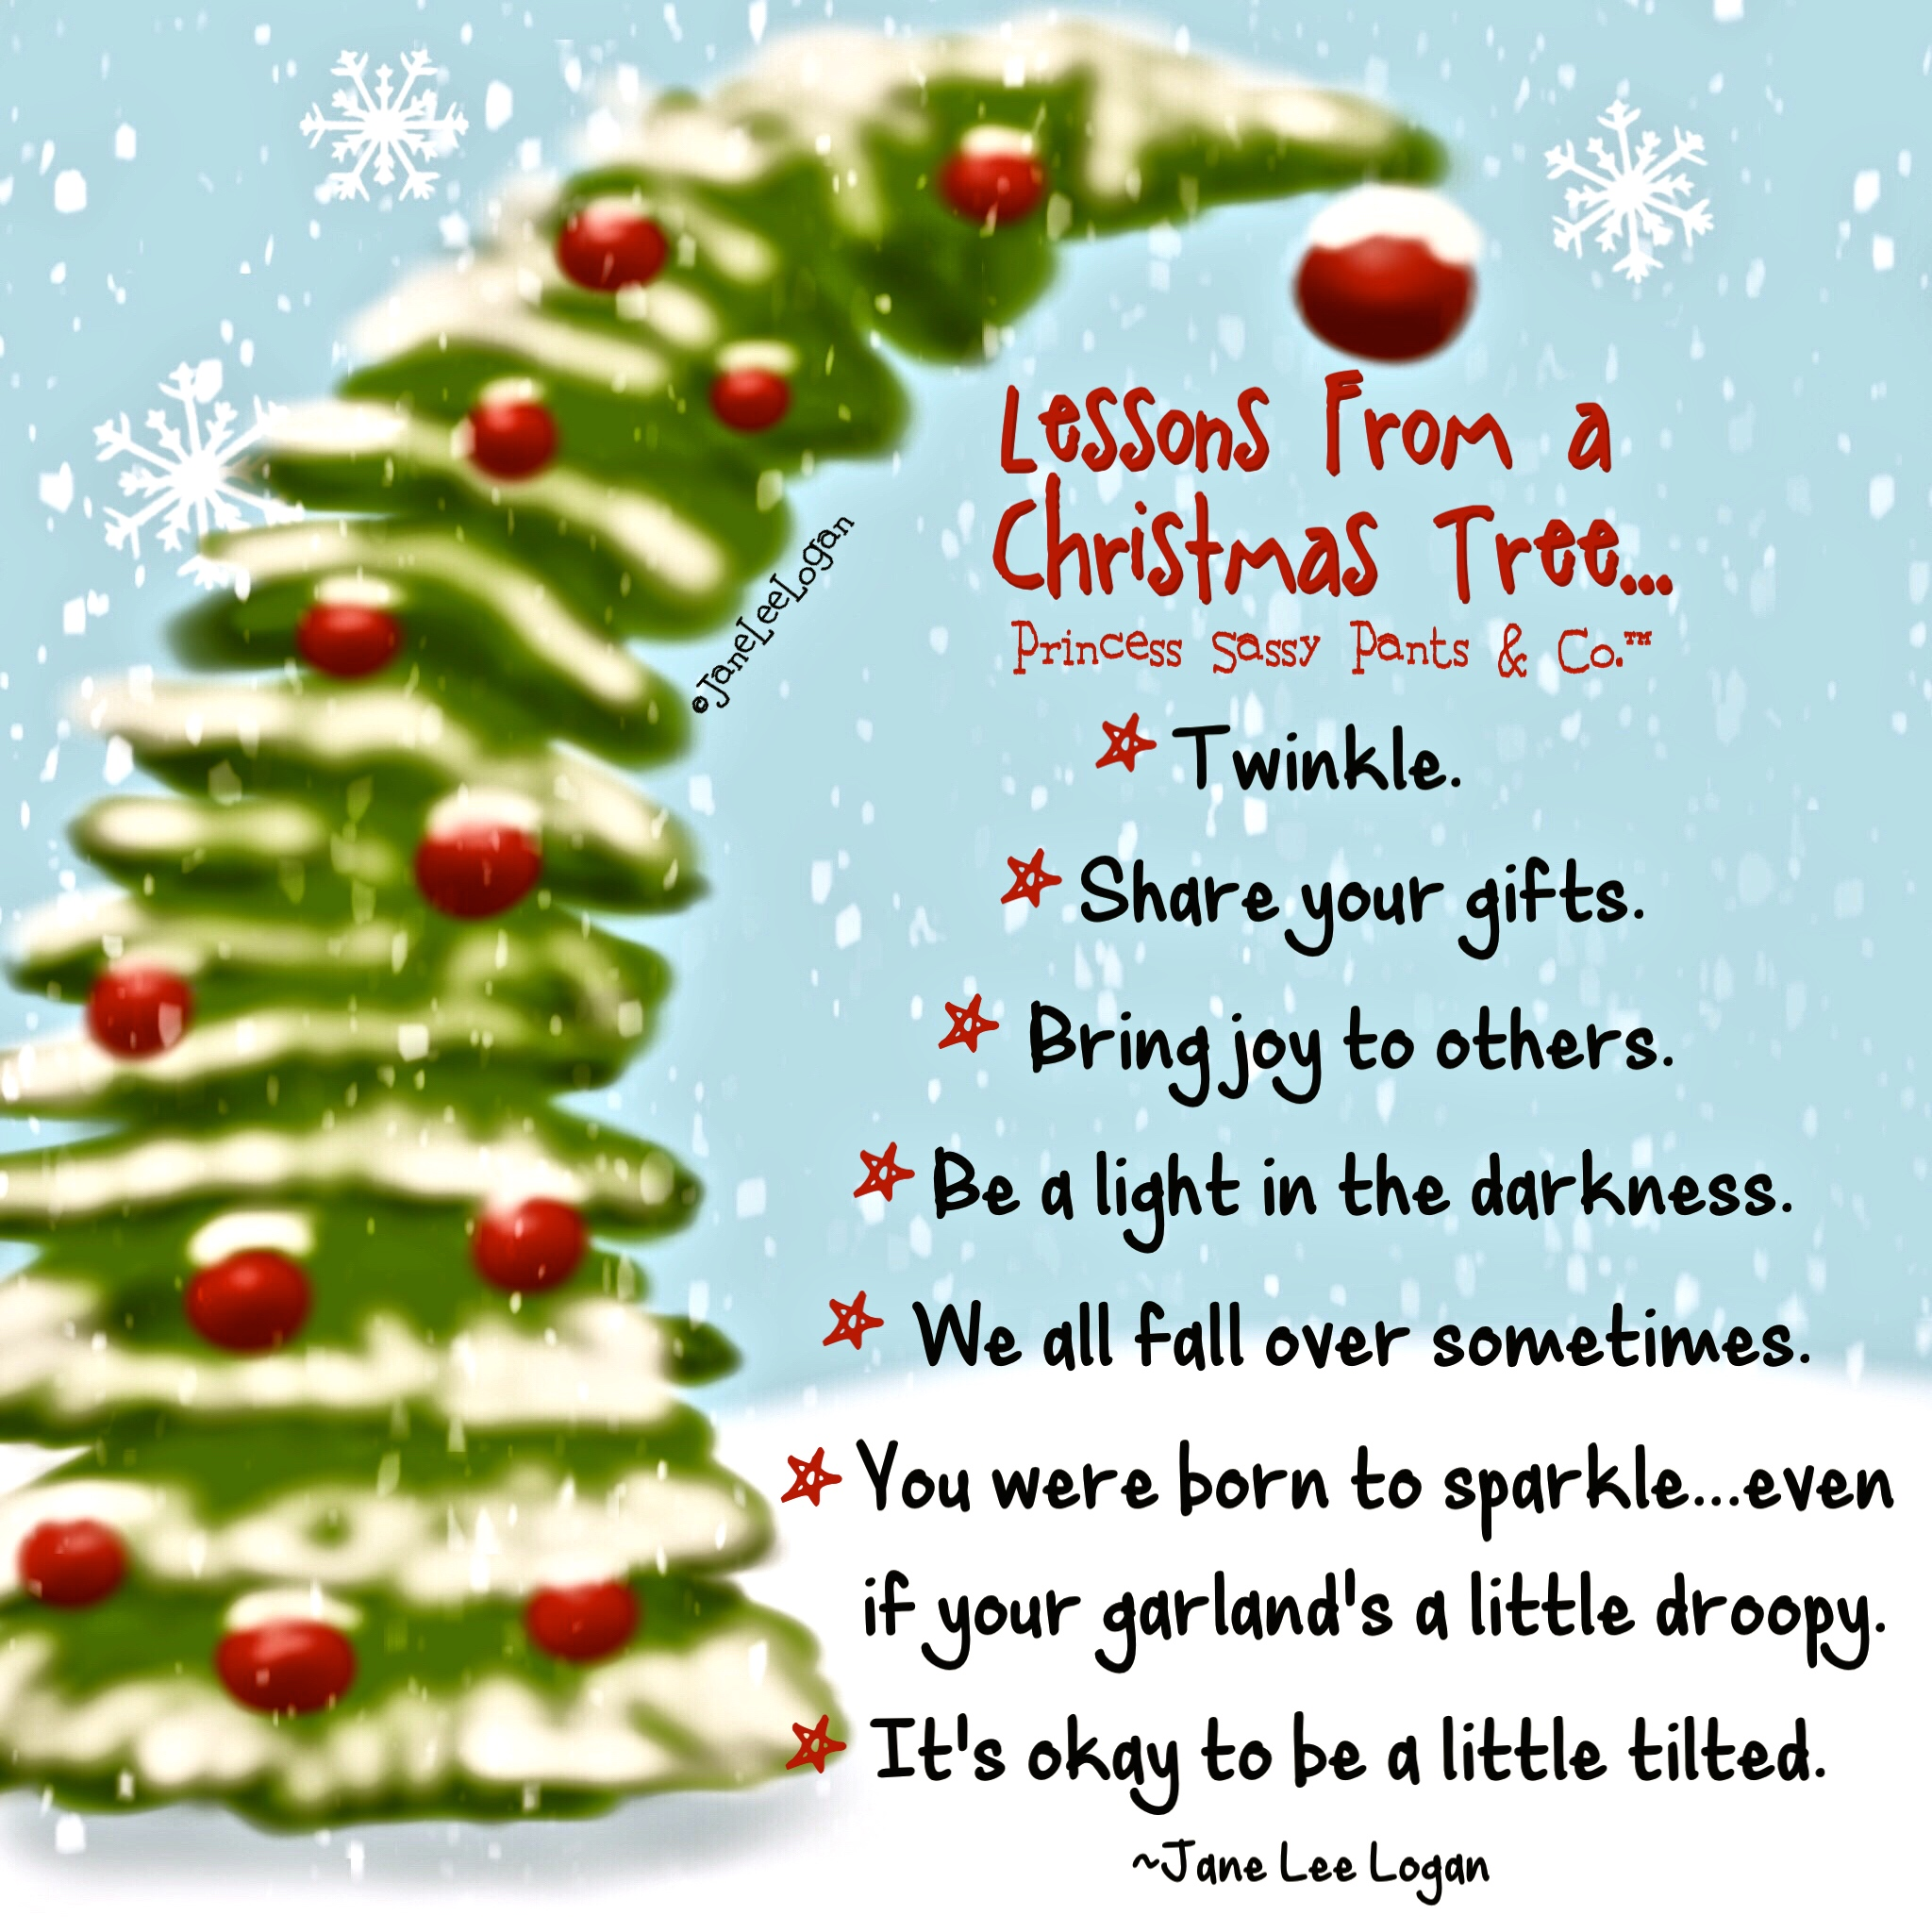 Poem About A Christmas Tree: Princess Sassy Pants & Co.™